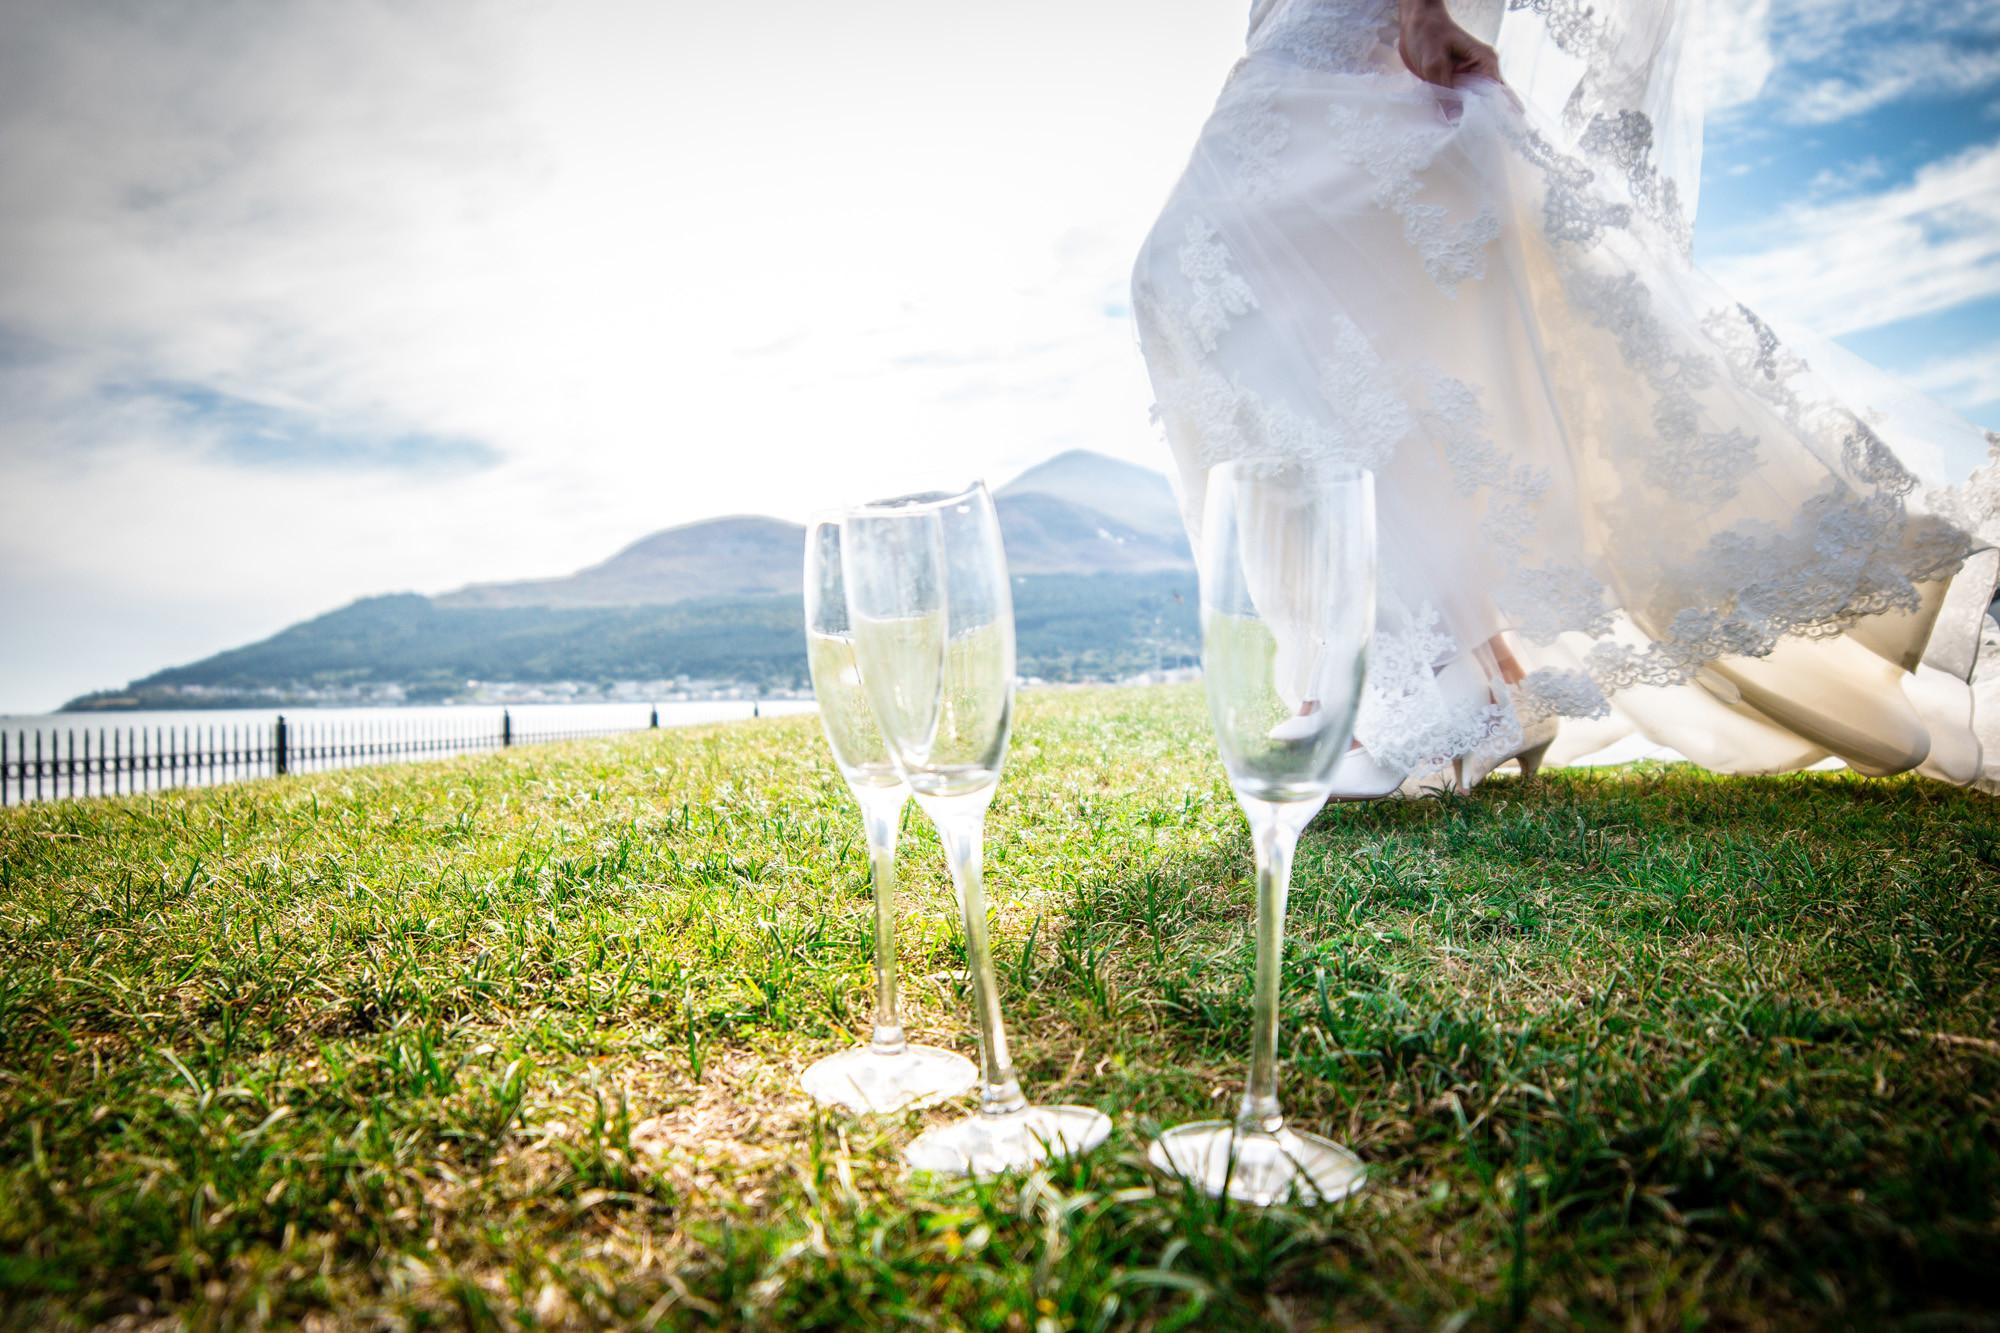 Orla & Niall - Slieve Donard Resort & Spa. Wedding photographer Andrew McKenna, Newcastle. County Down.